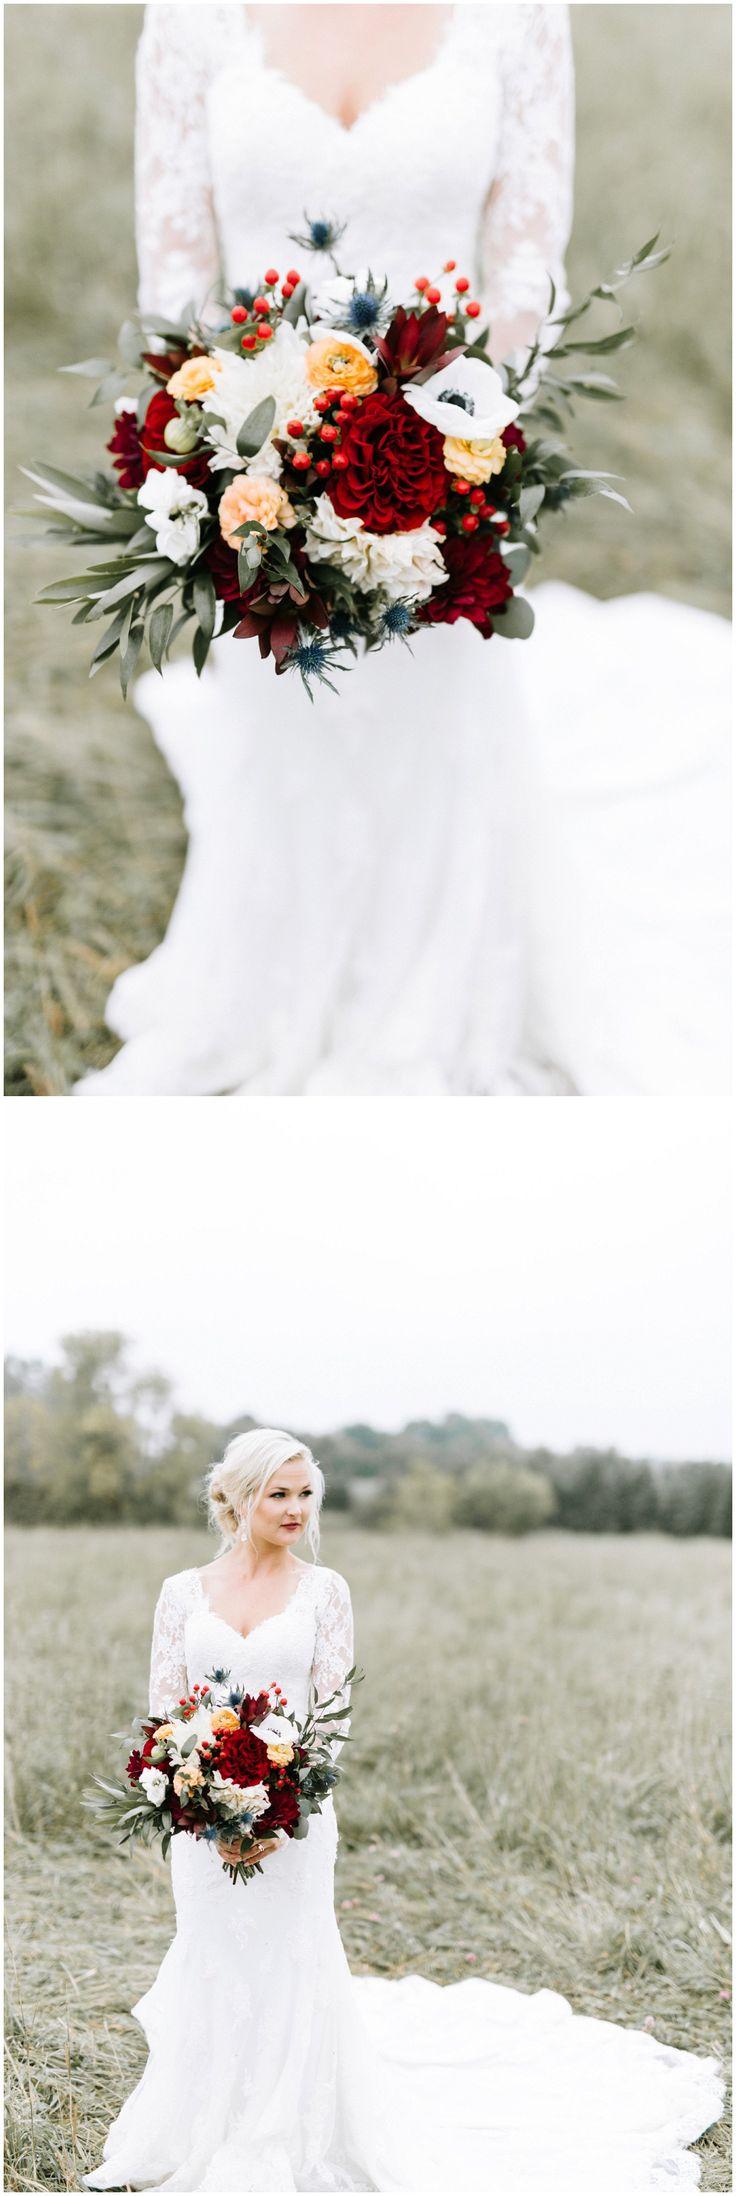 Bridal bouquet designed by Minneapolis wedding florist Artemisia Studios. Photo by Kate Becker Photography.